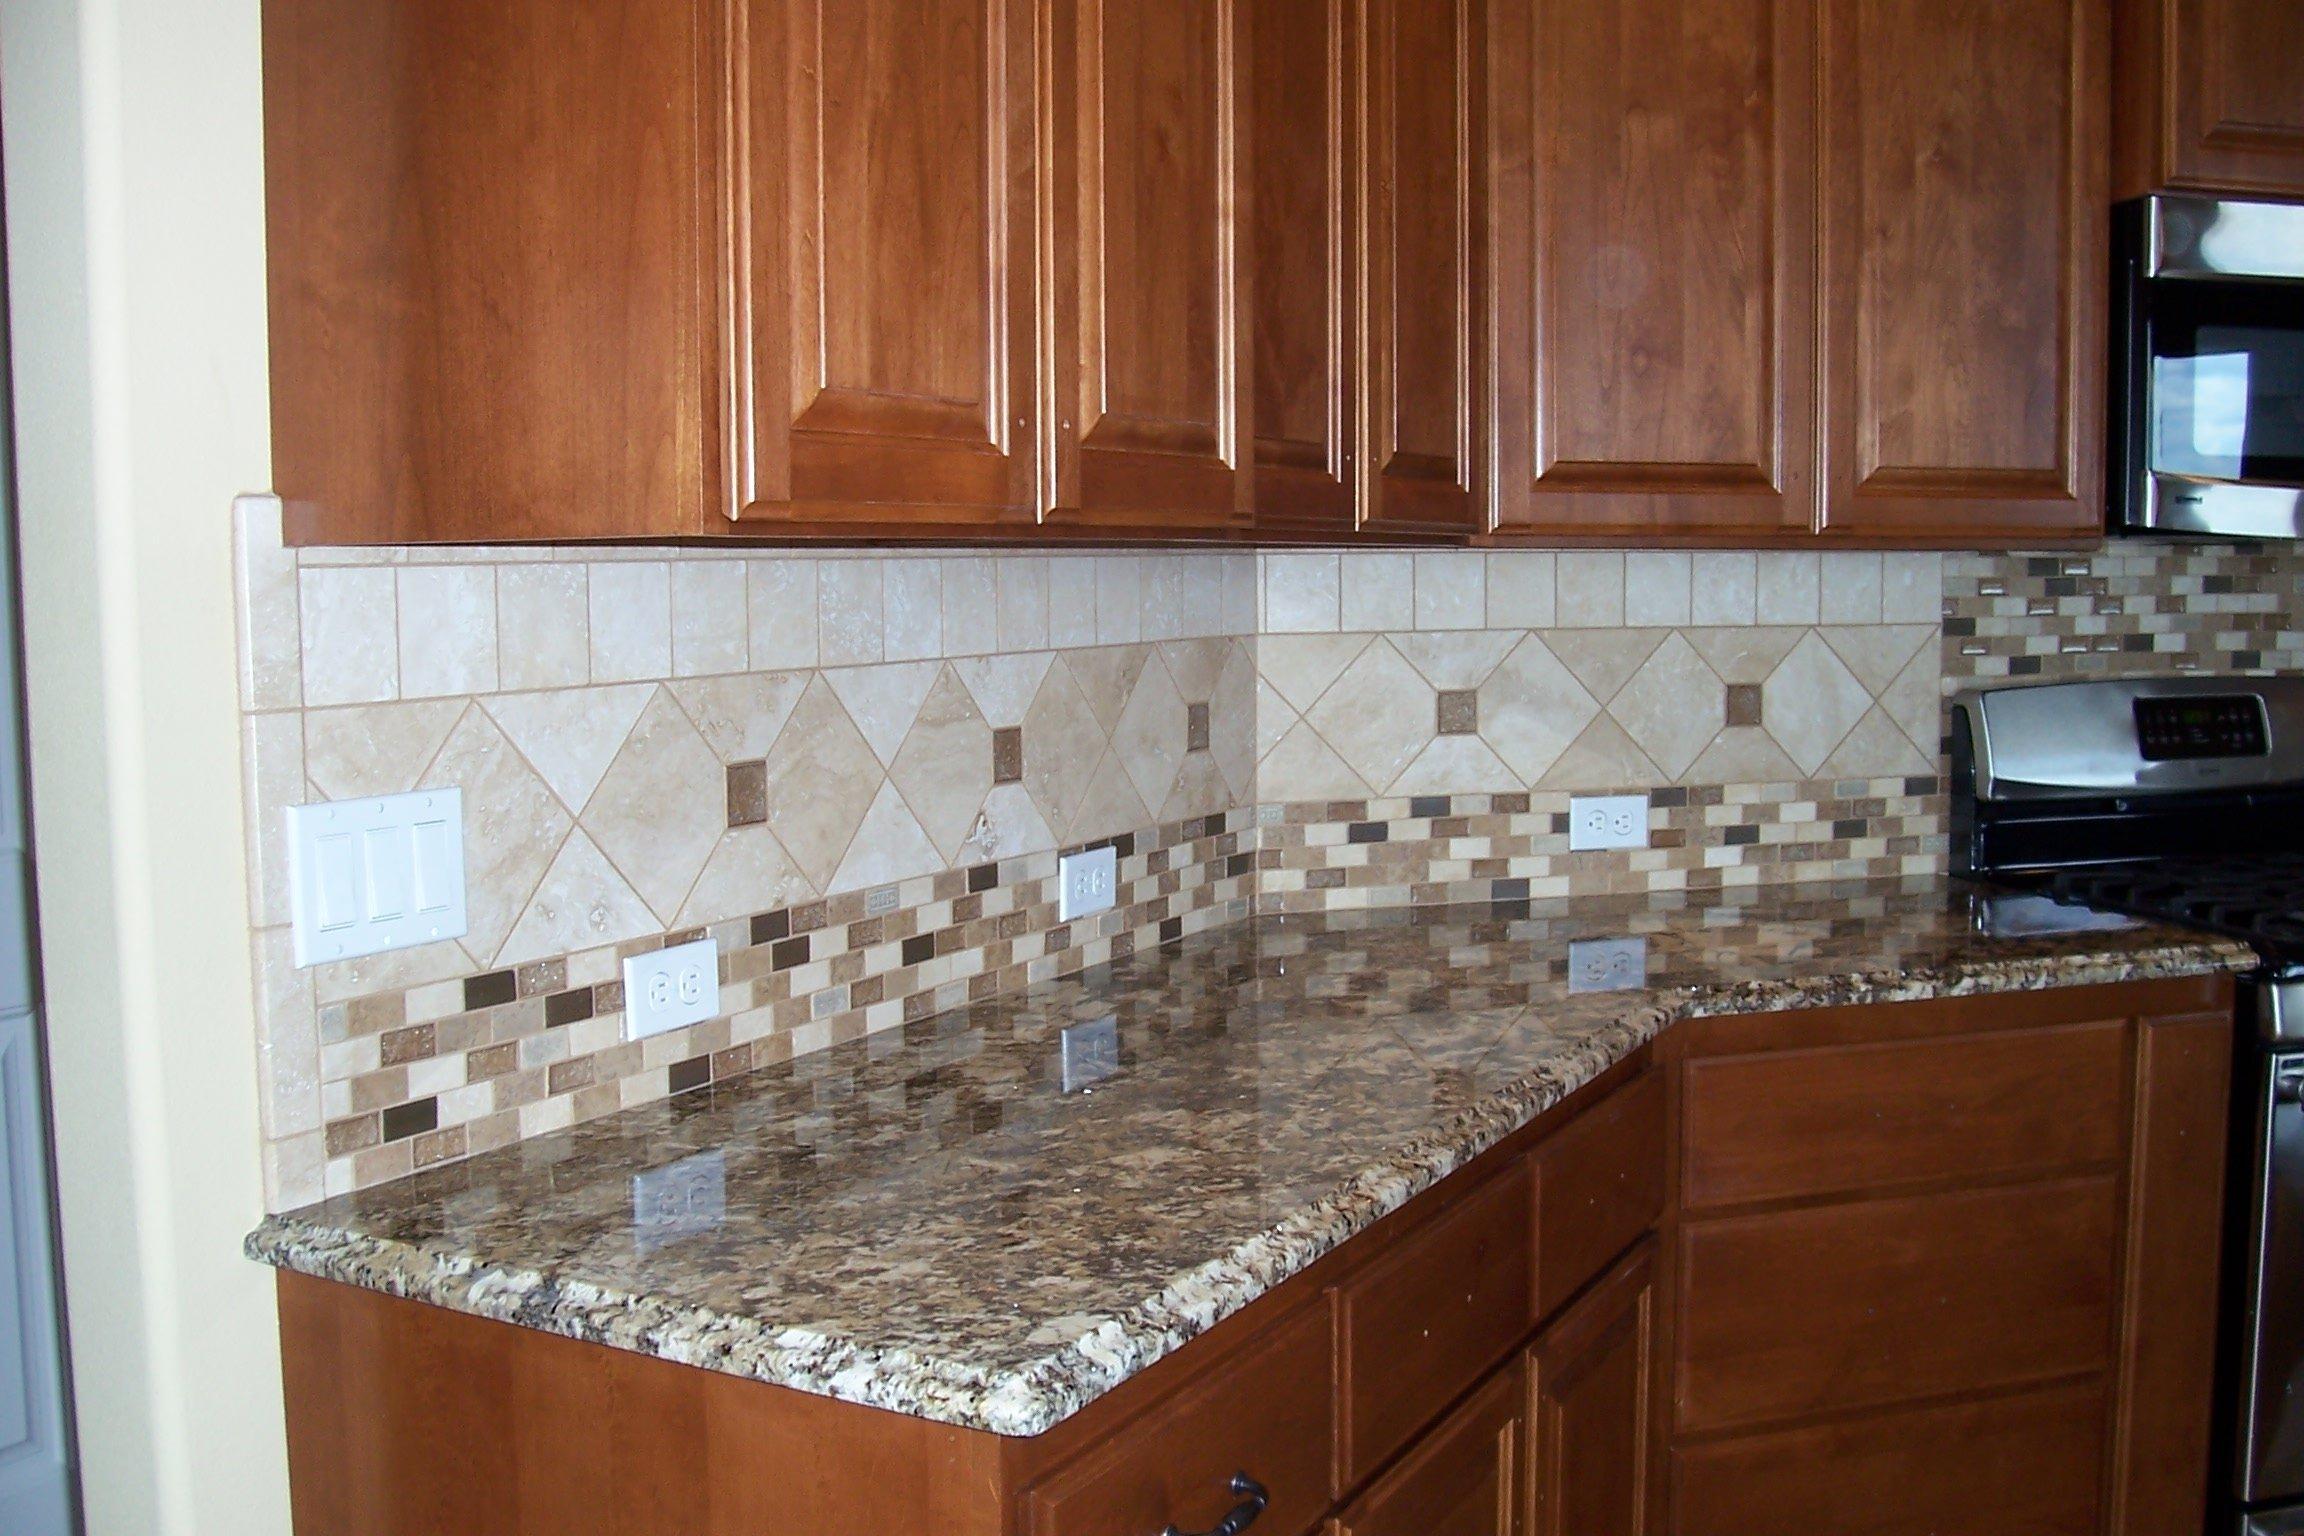 10 Fashionable Backsplash Tile Ideas For Kitchen elegant backsplash ideas kitchen related to house remodel plan with 2020